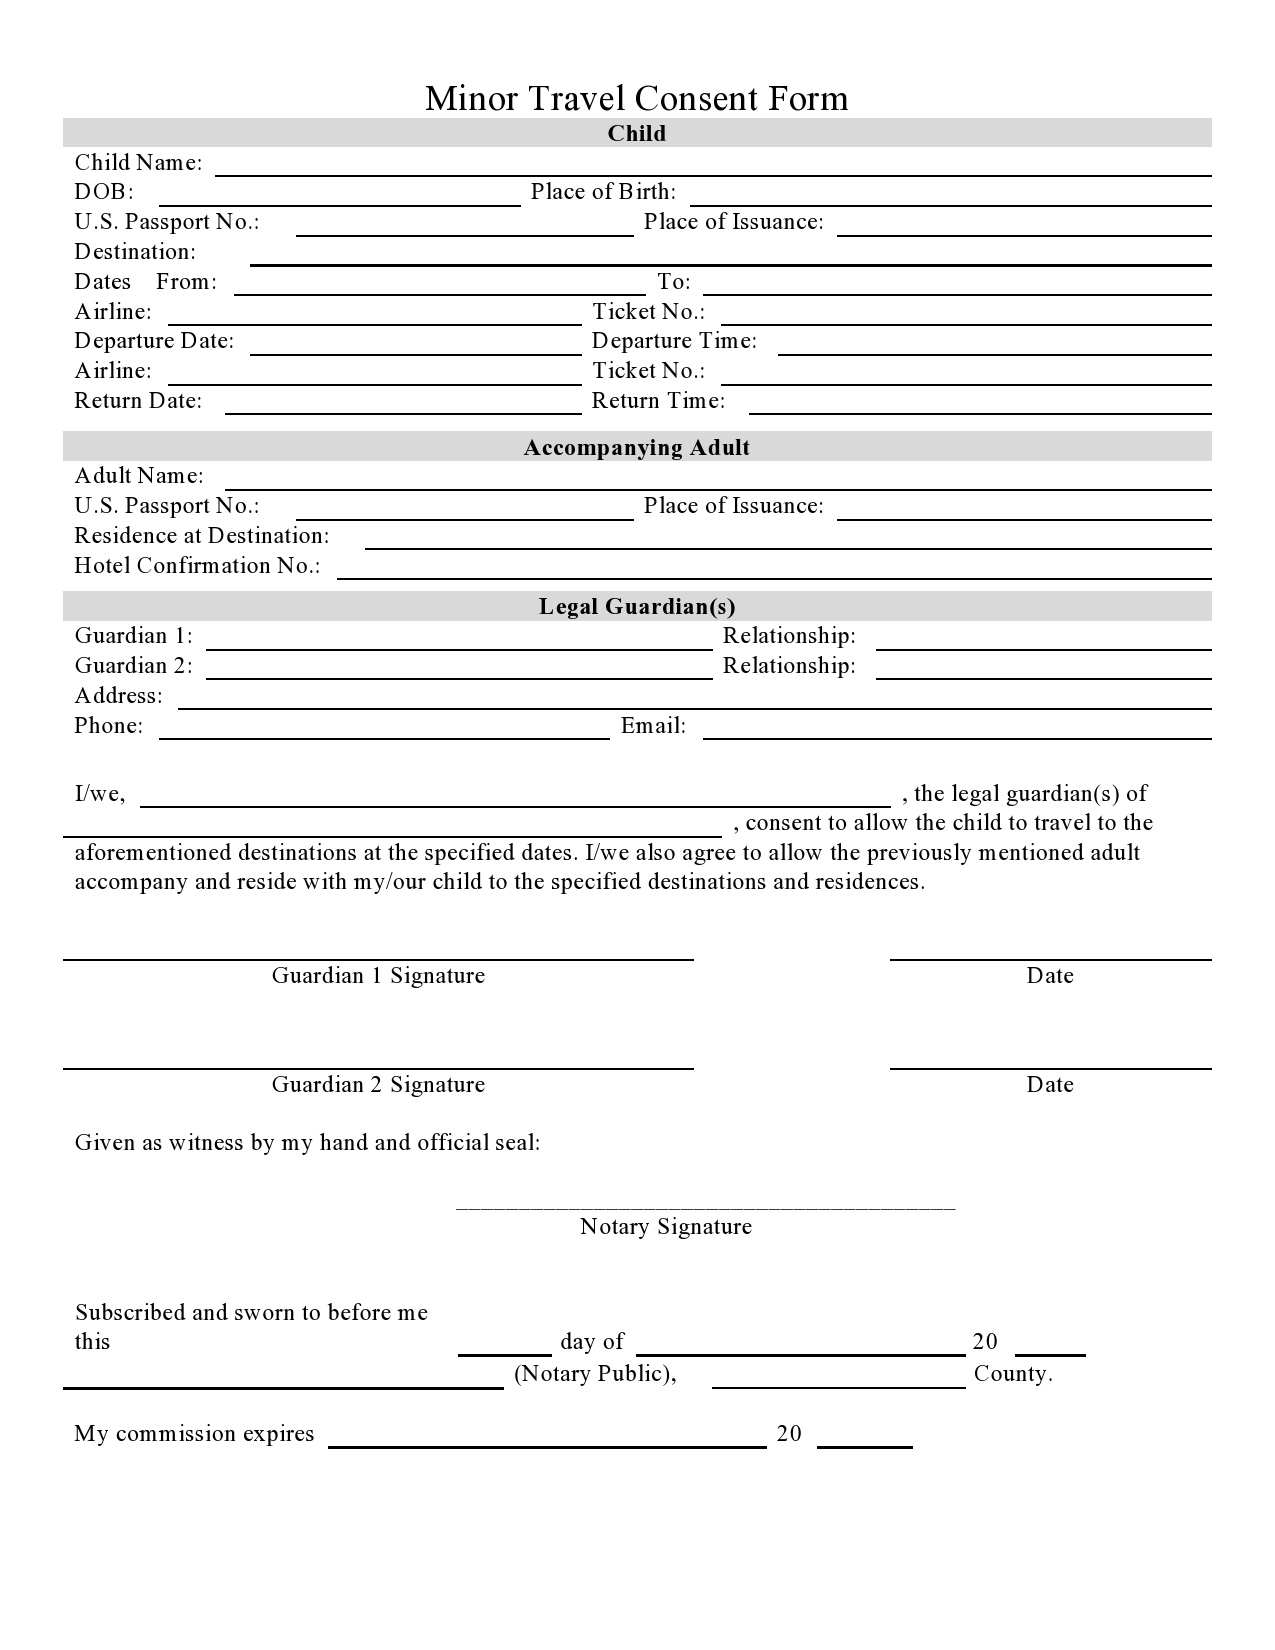 Free child travel consent form 33